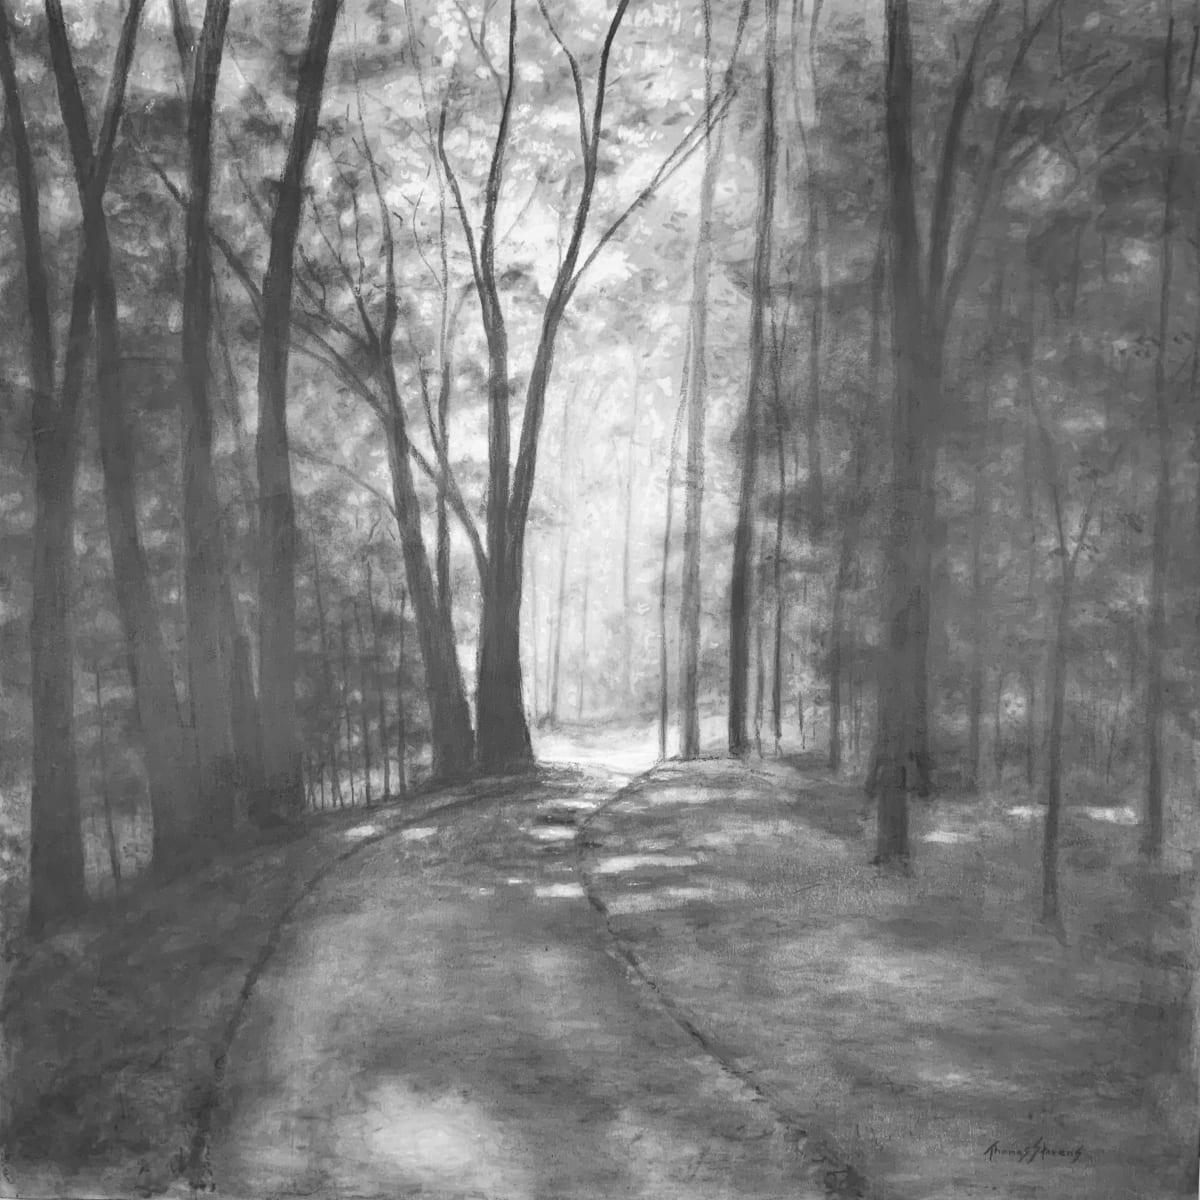 Riverwalk Morning View  36.07328N 79.10611W by Thomas Stevens